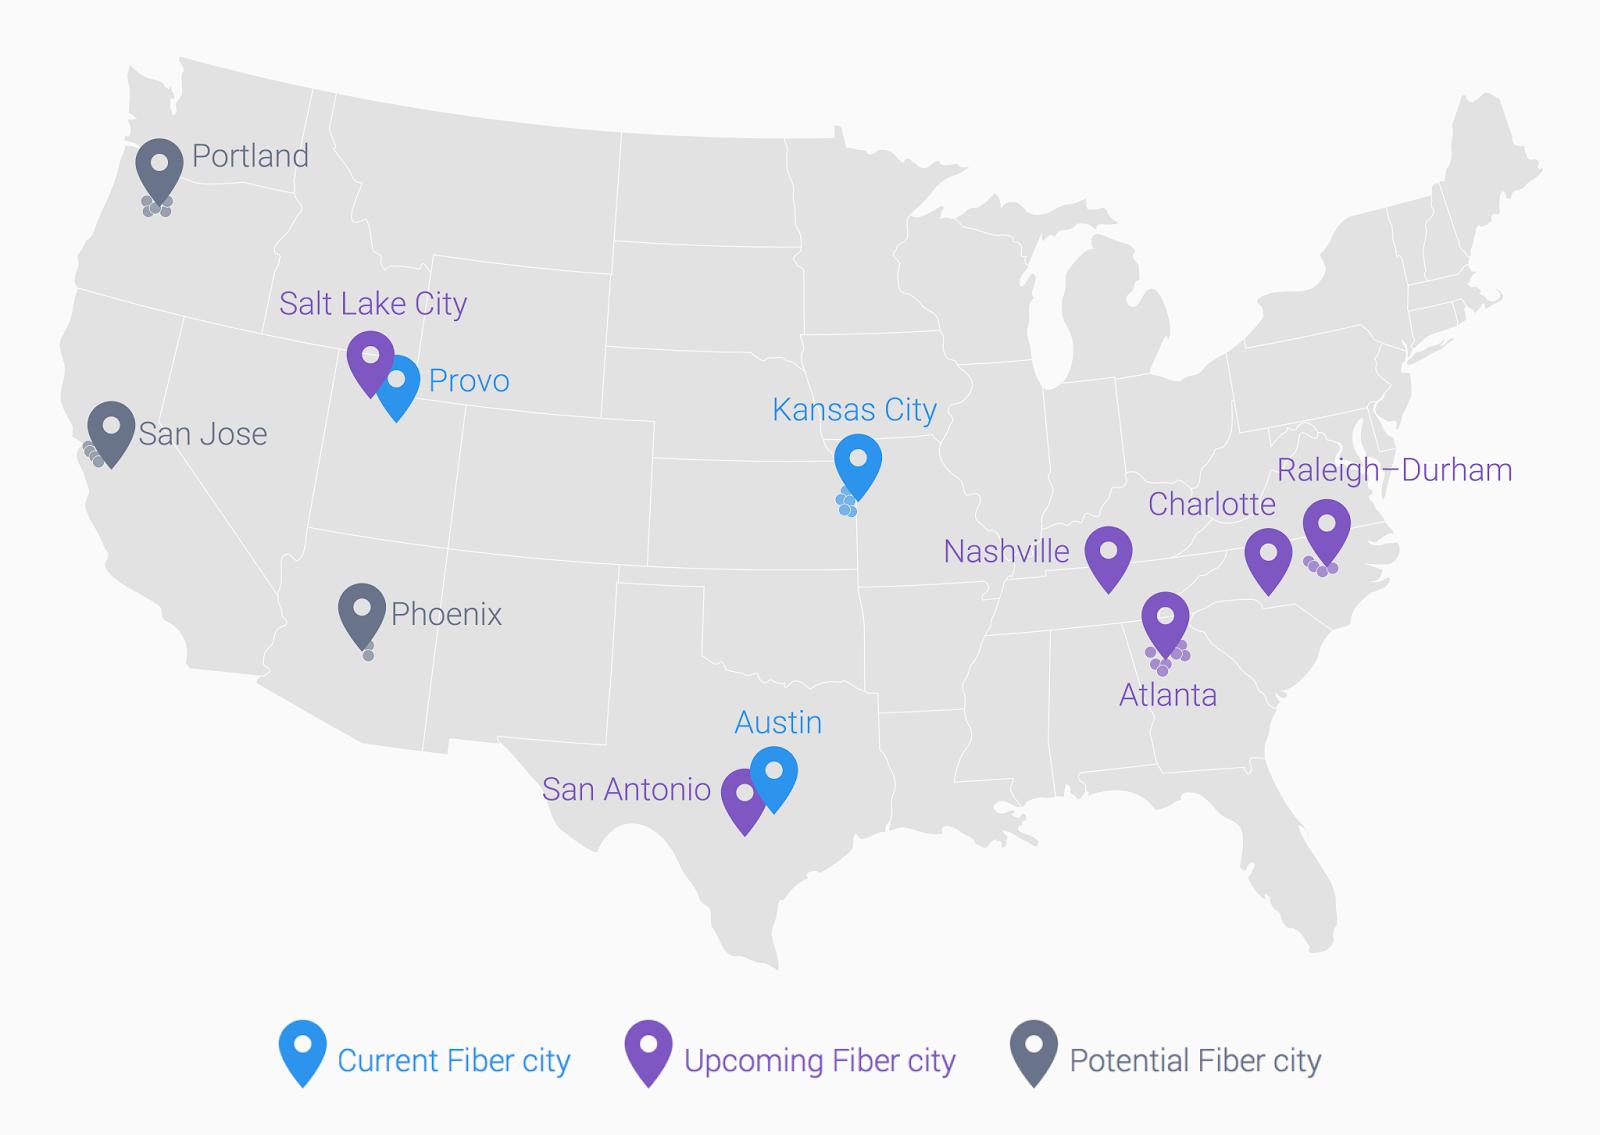 Intertubes A Study Of The Us Longhaul Fiberoptic Infrastructure Us Map With Charlotte